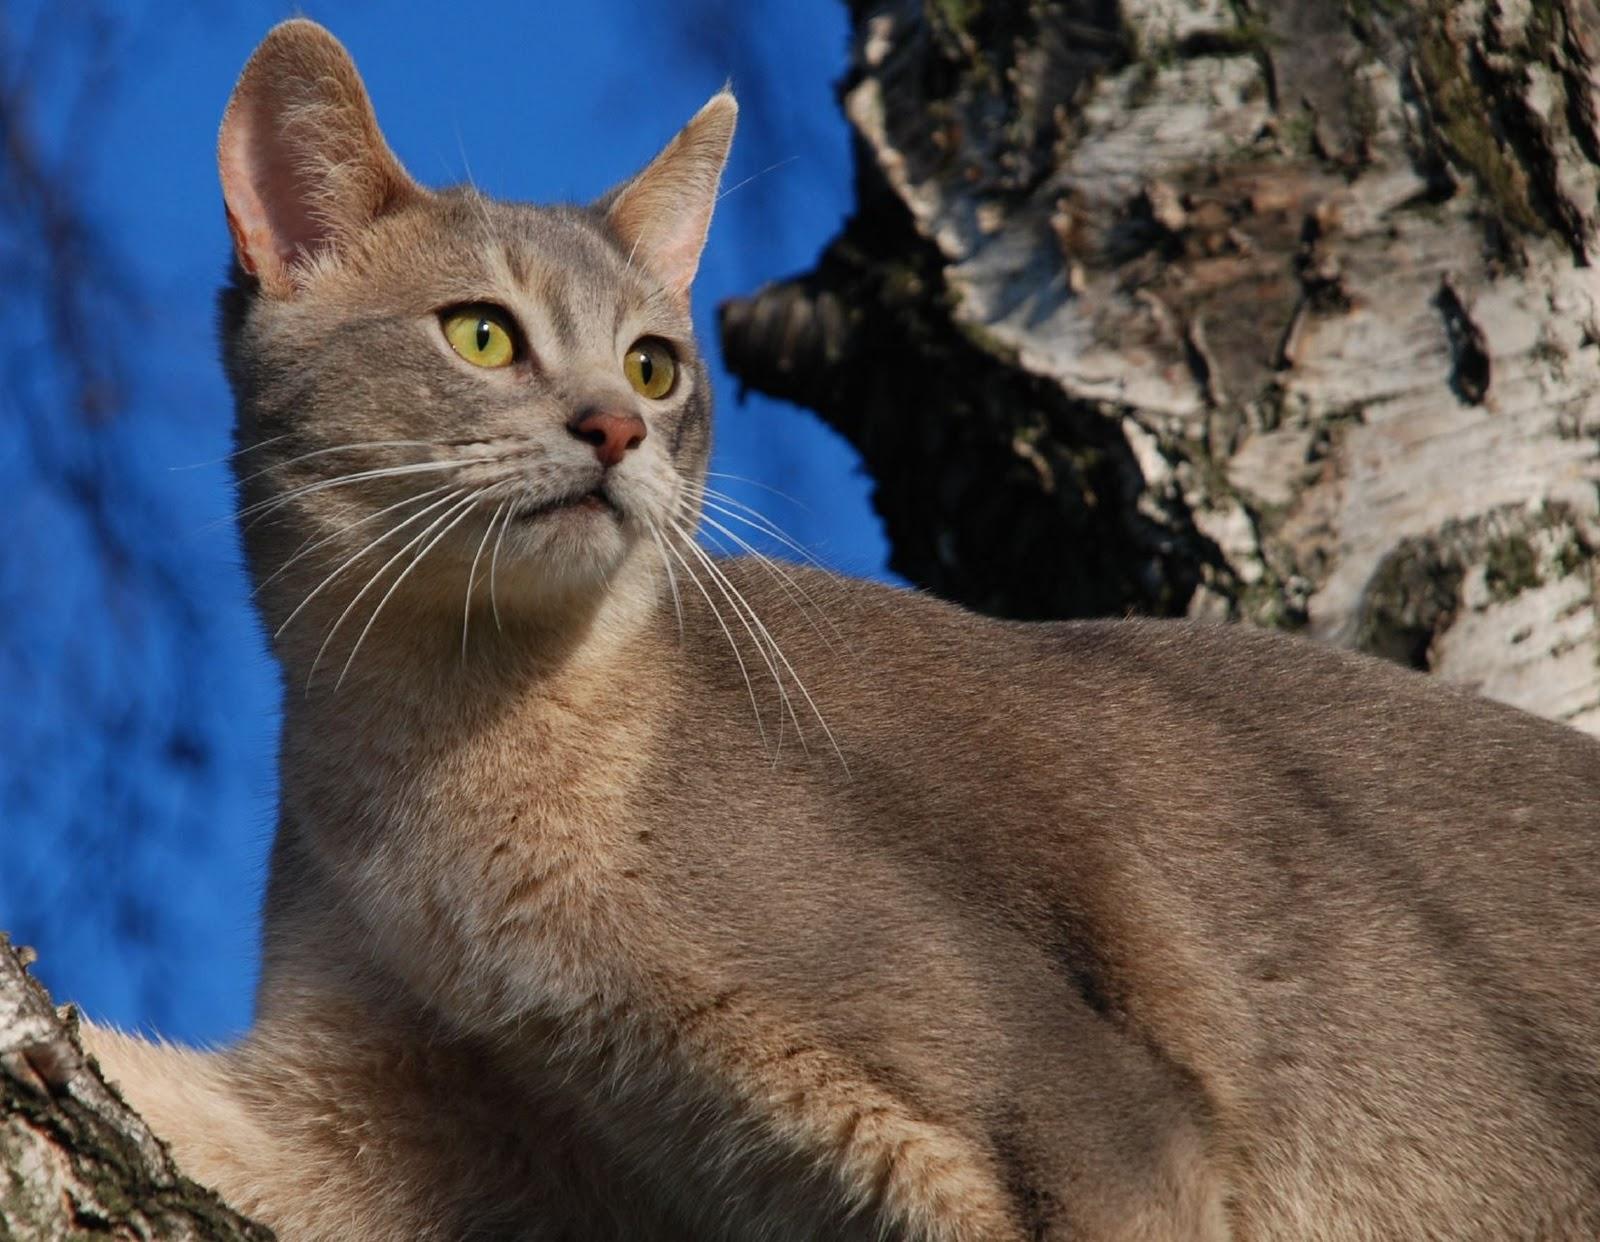 http://2.bp.blogspot.com/-uvOp8HFBuhI/Tx75DqmYKJI/AAAAAAAAFP4/ywAH48MzqSA/s1600/Abyssinian+Cat+Breed++%252843%2529.jpg